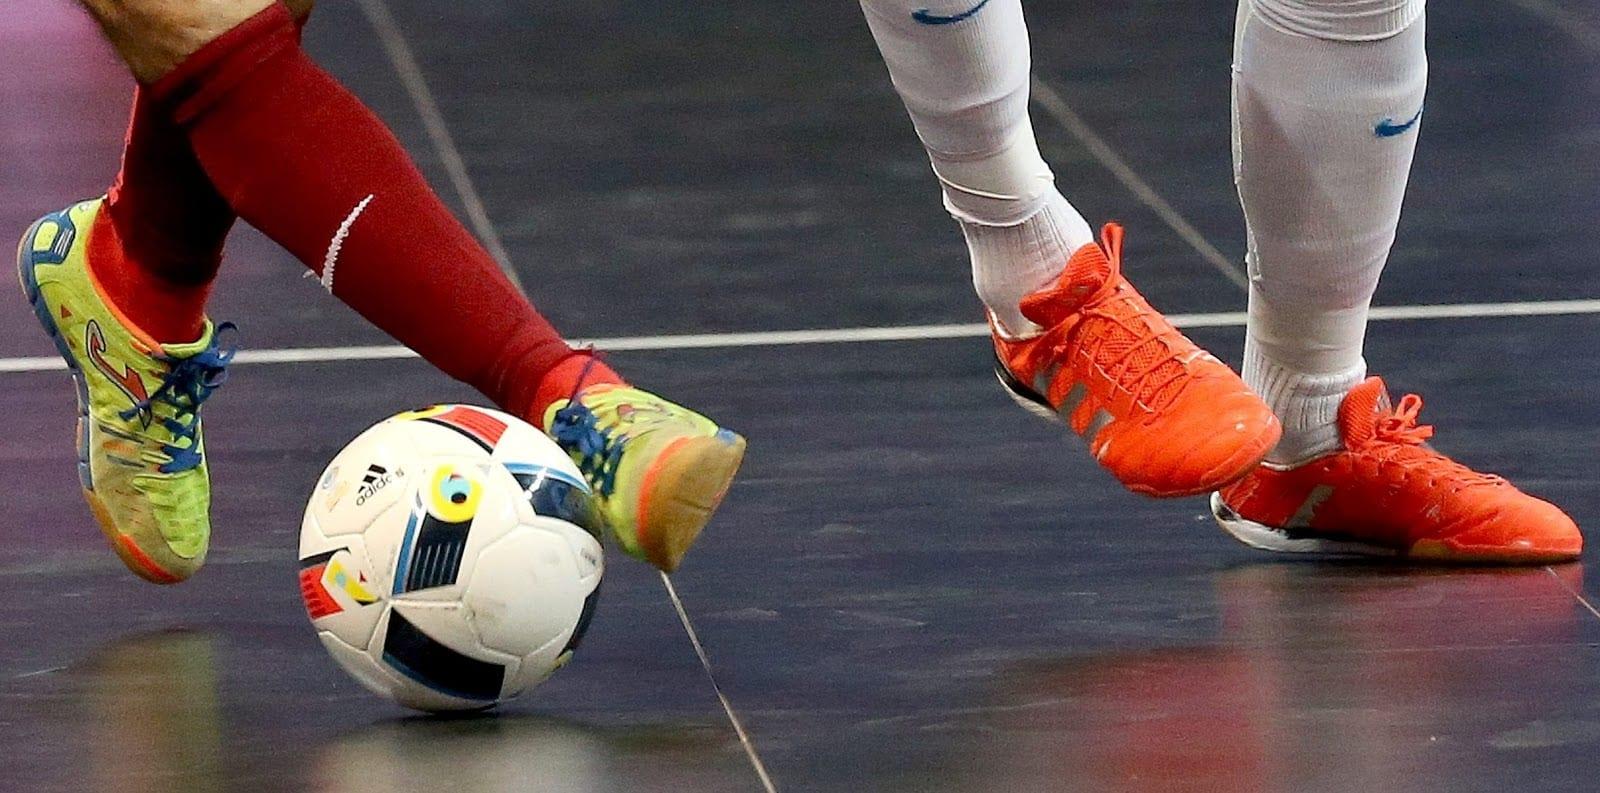 Final do Campeonato Municipal de Futsal será nesta sexta-feira ... c67934a443fc6